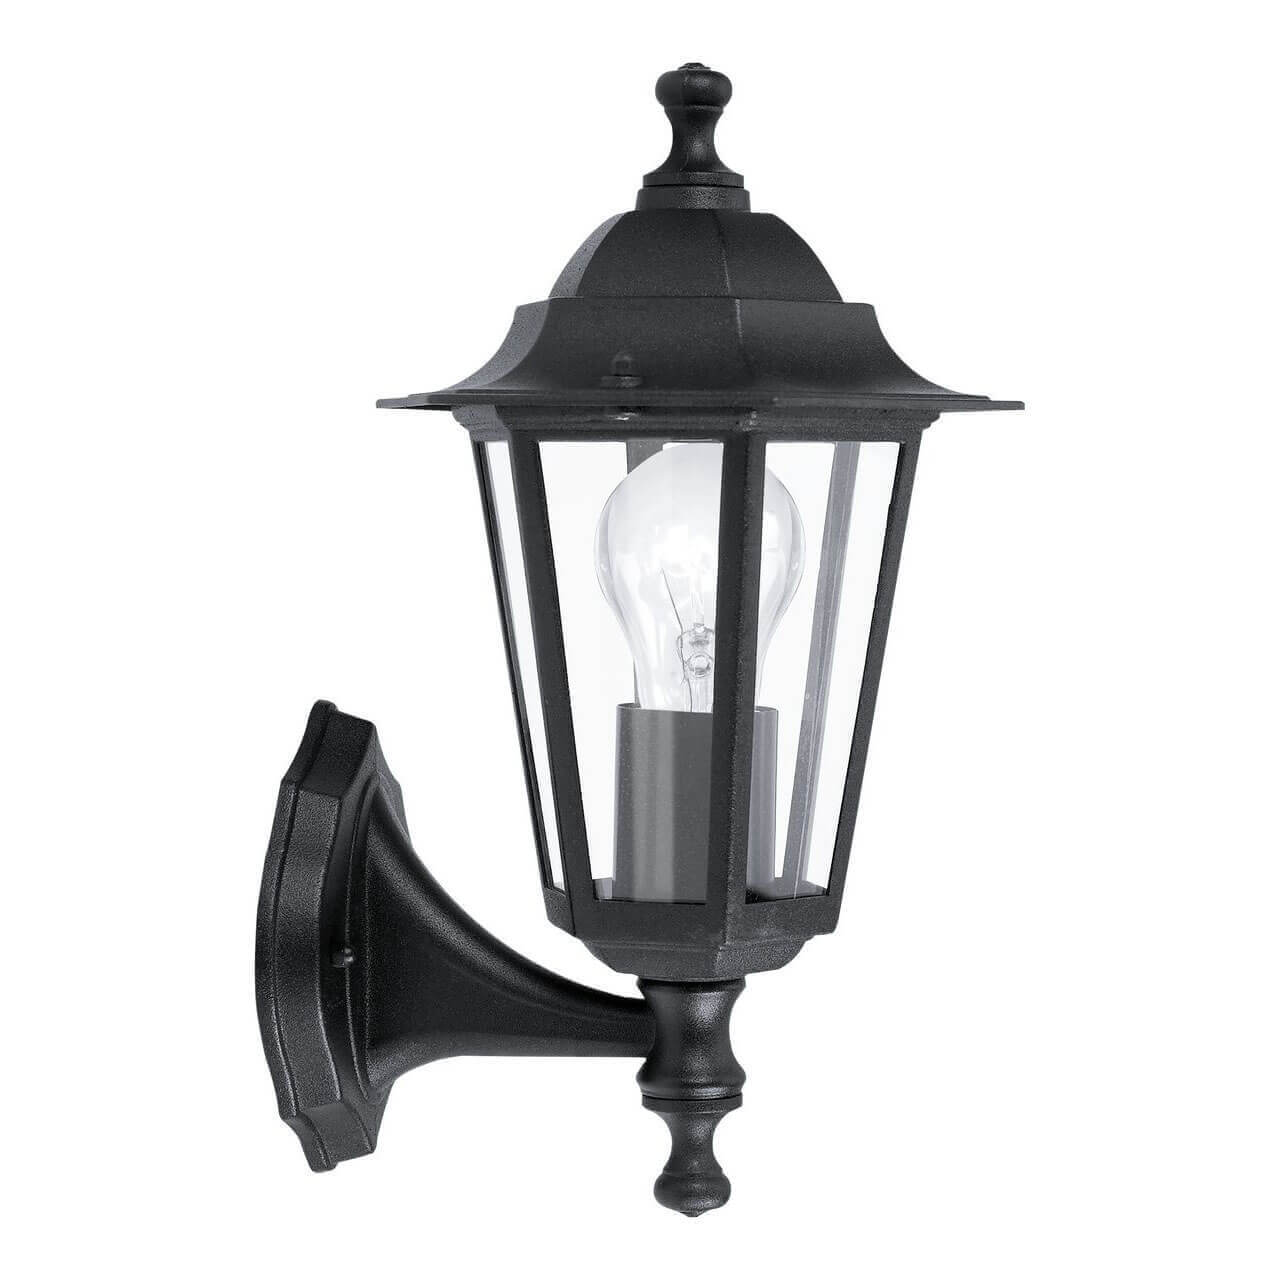 Светильник Eglo 22468 Laterna цена 2017